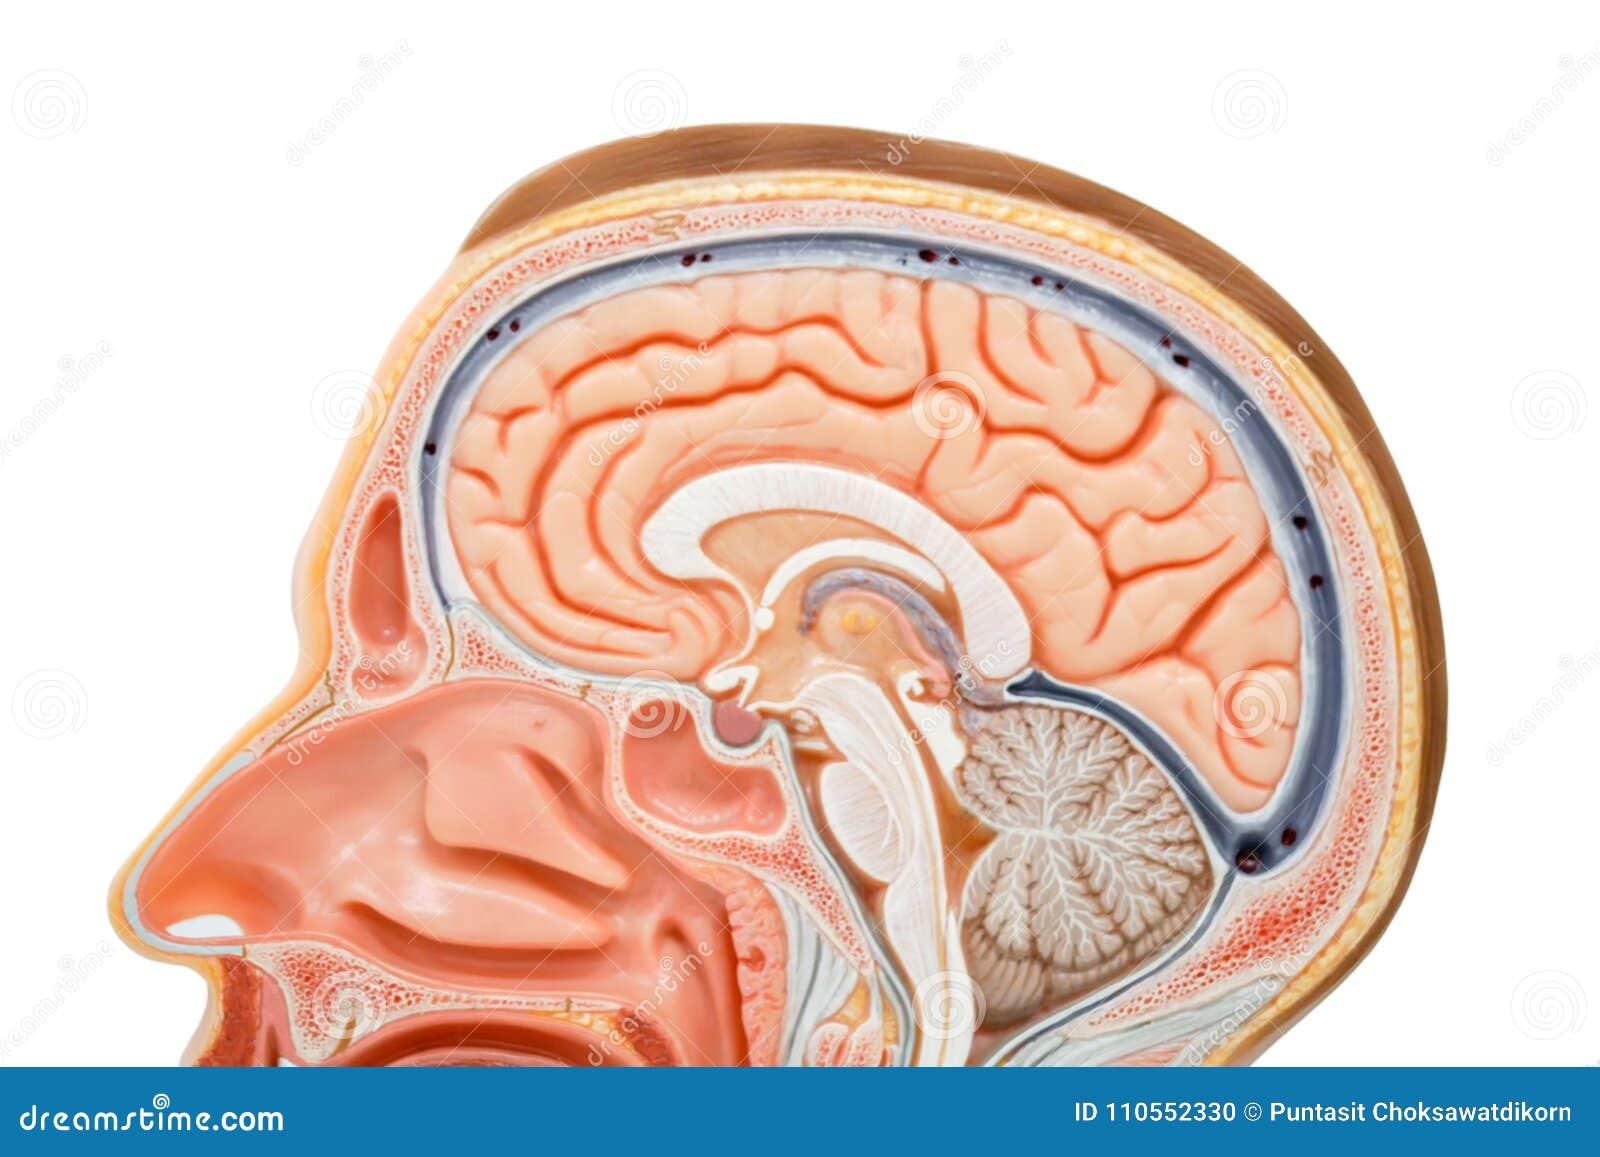 Human brain anatomy model stock photo. Image of lateral - 110552330